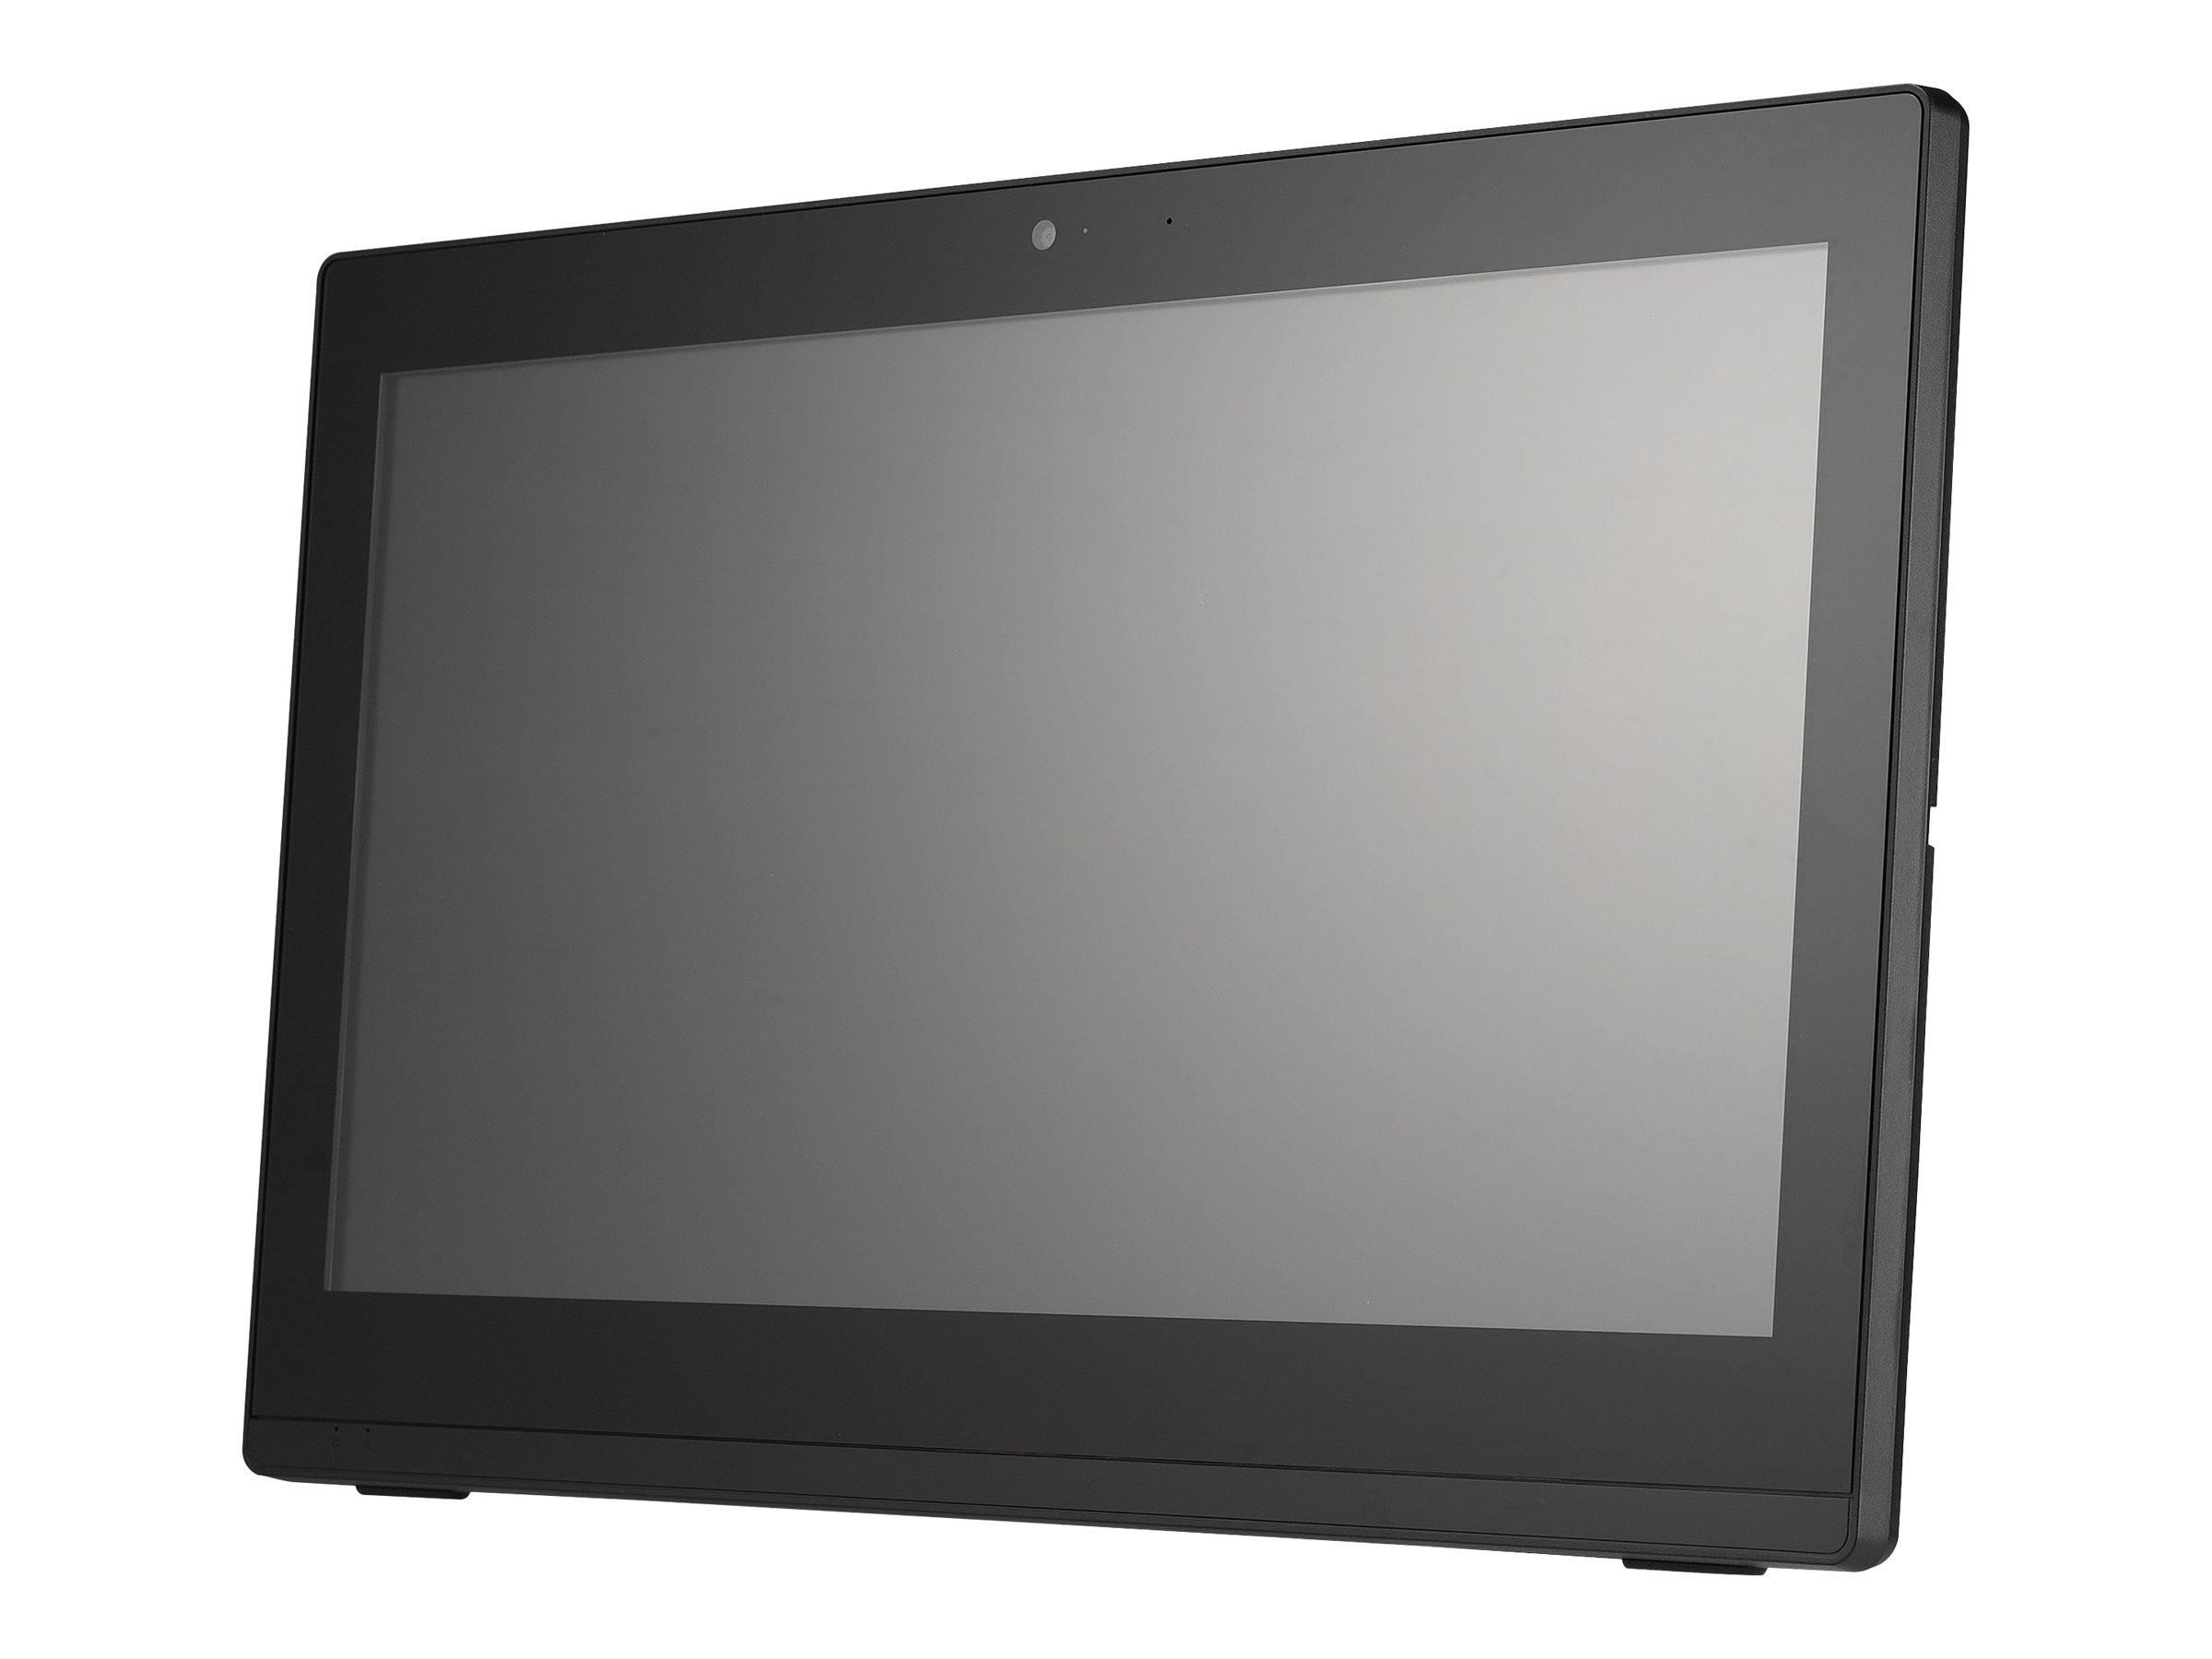 Shuttle XPC P90U3 - Barebone - All-in-One (Komplettlösung) - 1 x Core i3 7100U / 2.4 GHz ULV - HD Graphics 620 - GigE